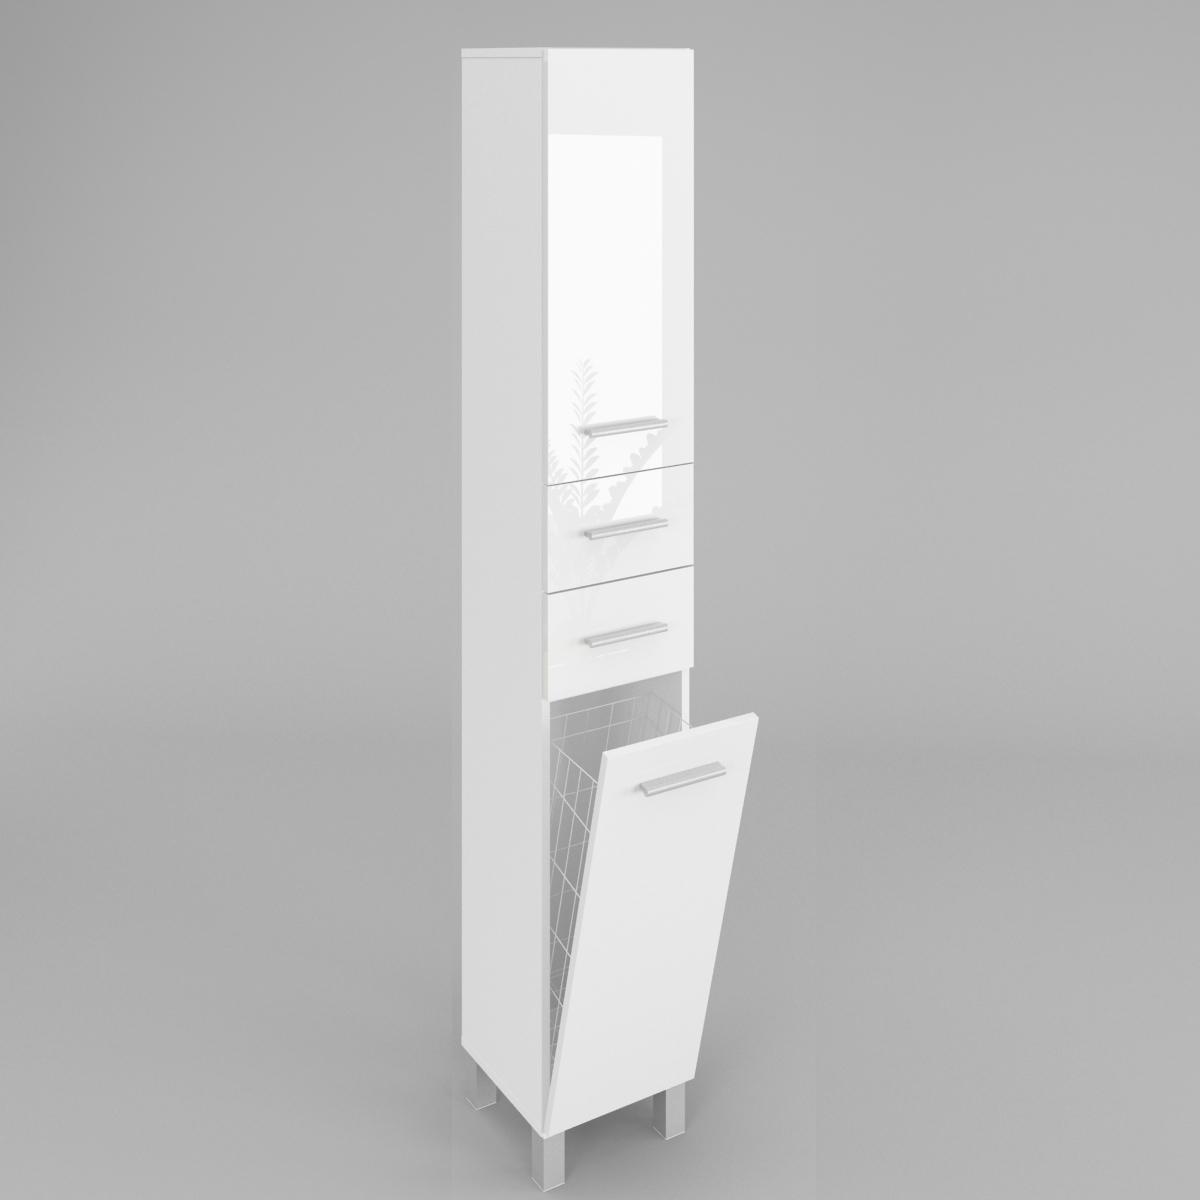 Badezimmer Hochschrank SW4 - Labi MöbelLabi Möbel